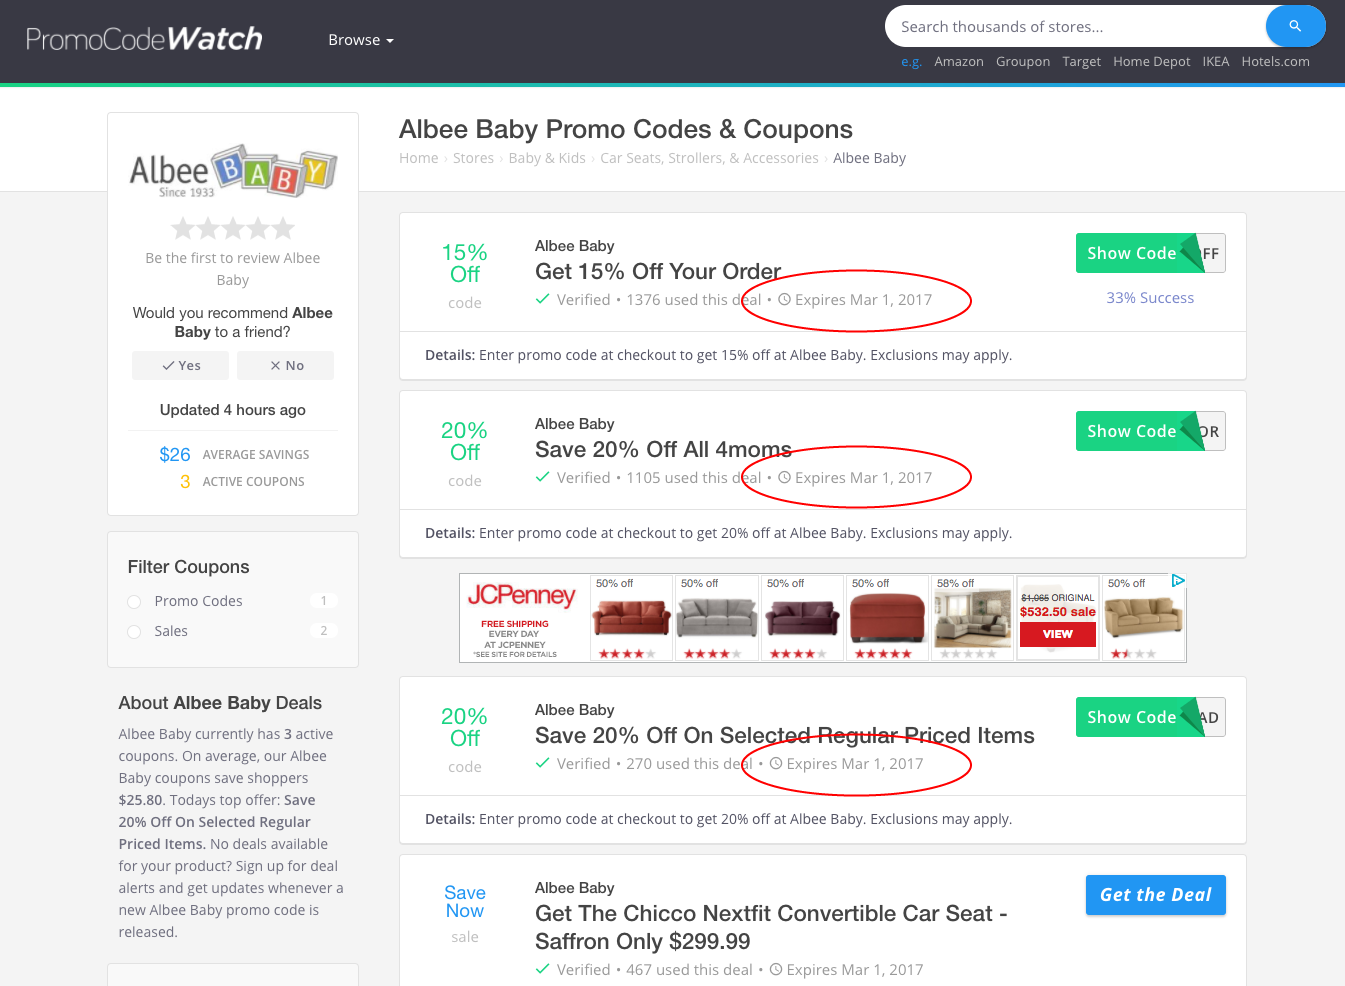 PromoCodeWatch: UI Cloaking & Deceptive Content Documented